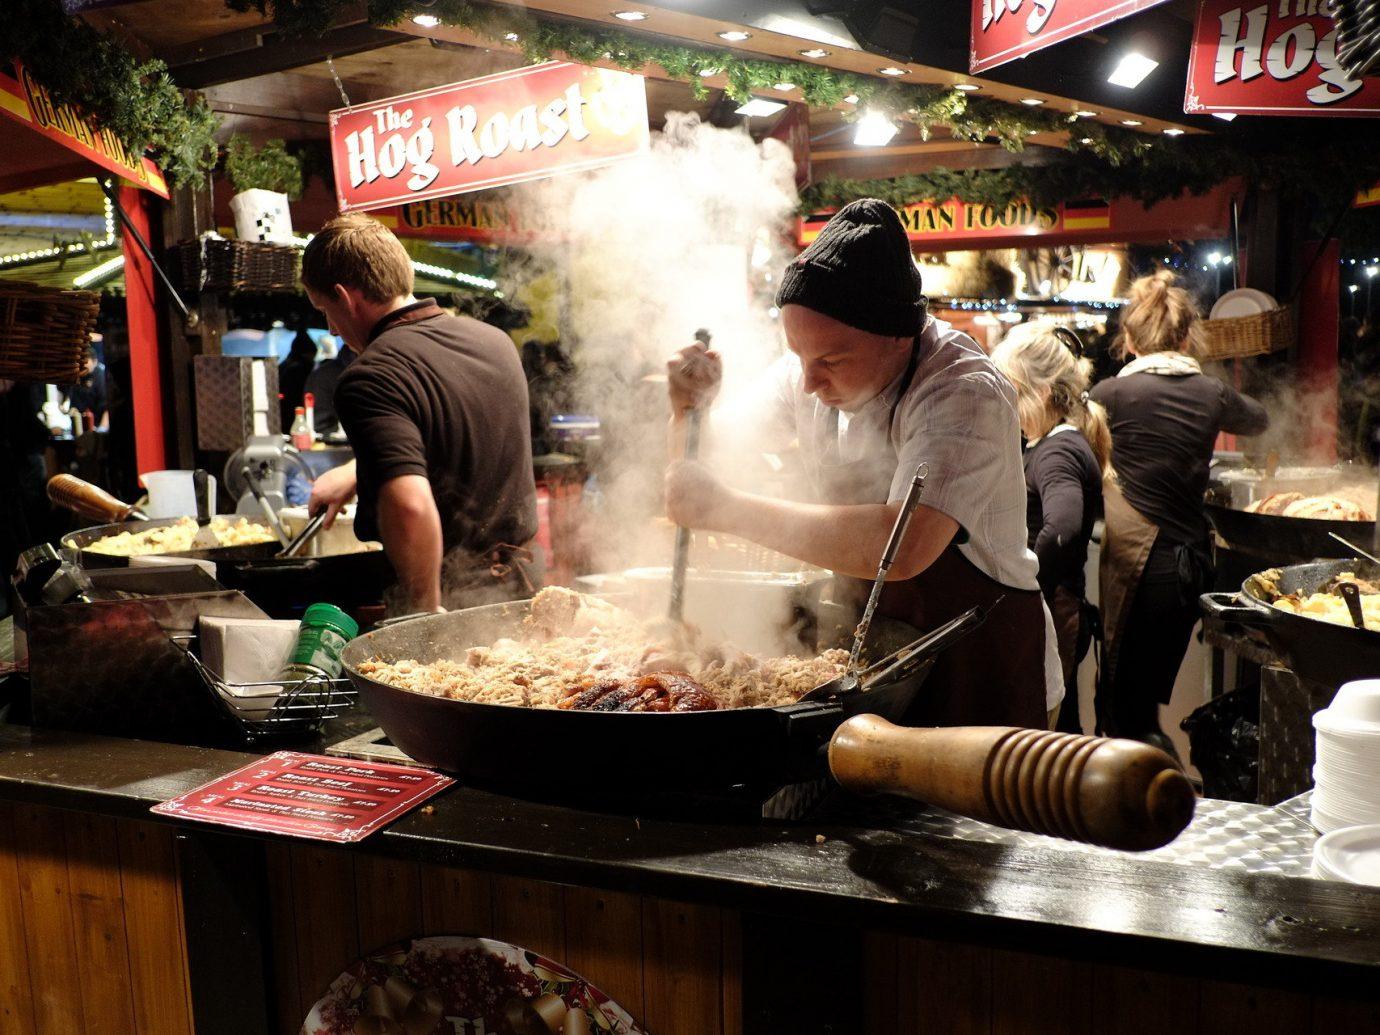 Budget person food public space City street food restaurant dish Bar sense market cooking preparing